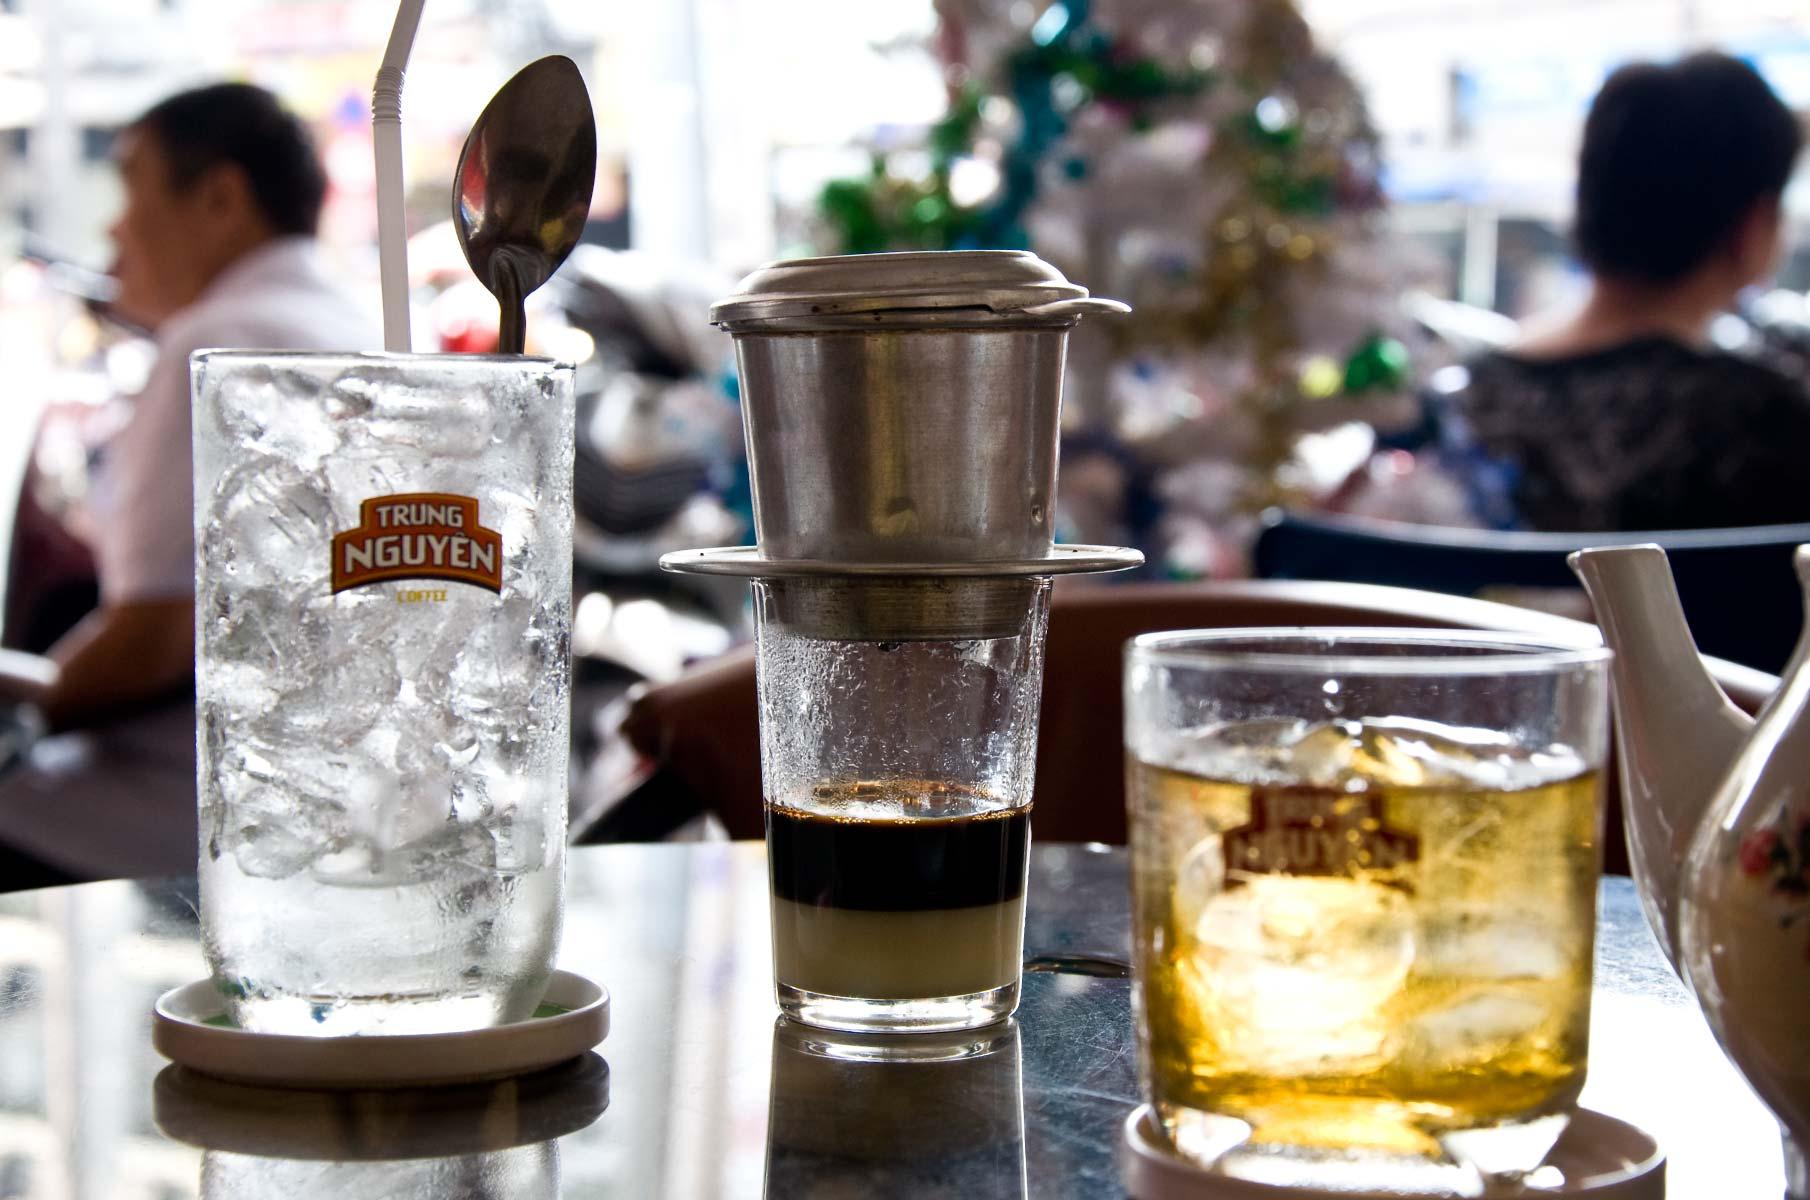 Trung Nguyen Kaffee in Saigon (Ho-Chi-Minh Stadt), Vietnam